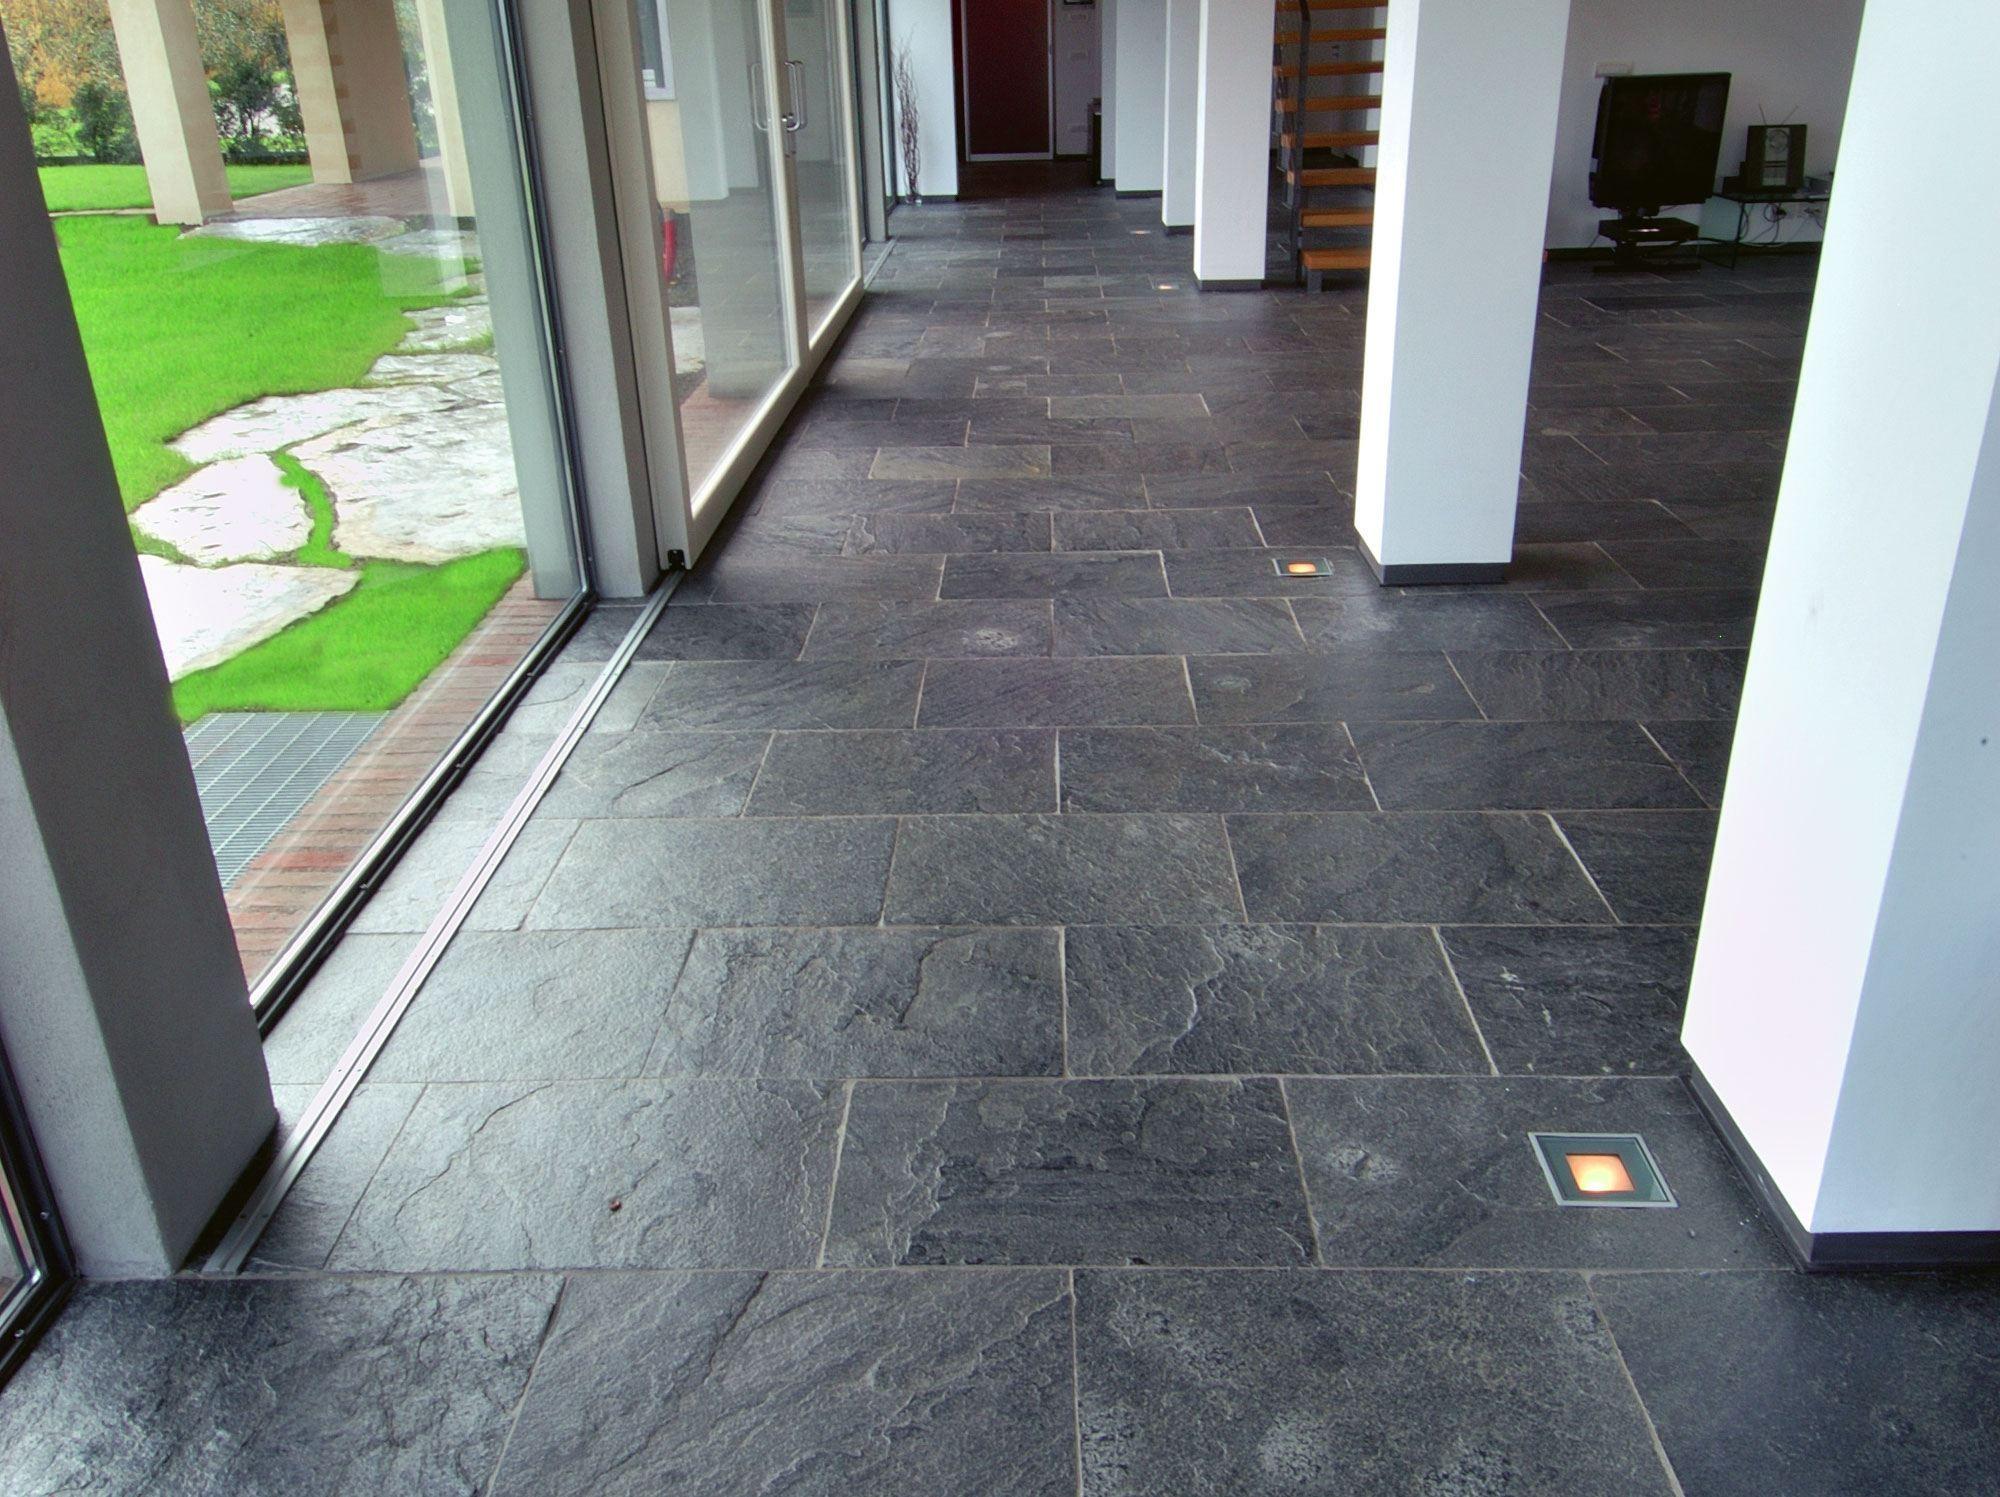 Natural slate flooring flooring designs artesia stone wall floor tiles by design francesca dondero dailygadgetfo Image collections